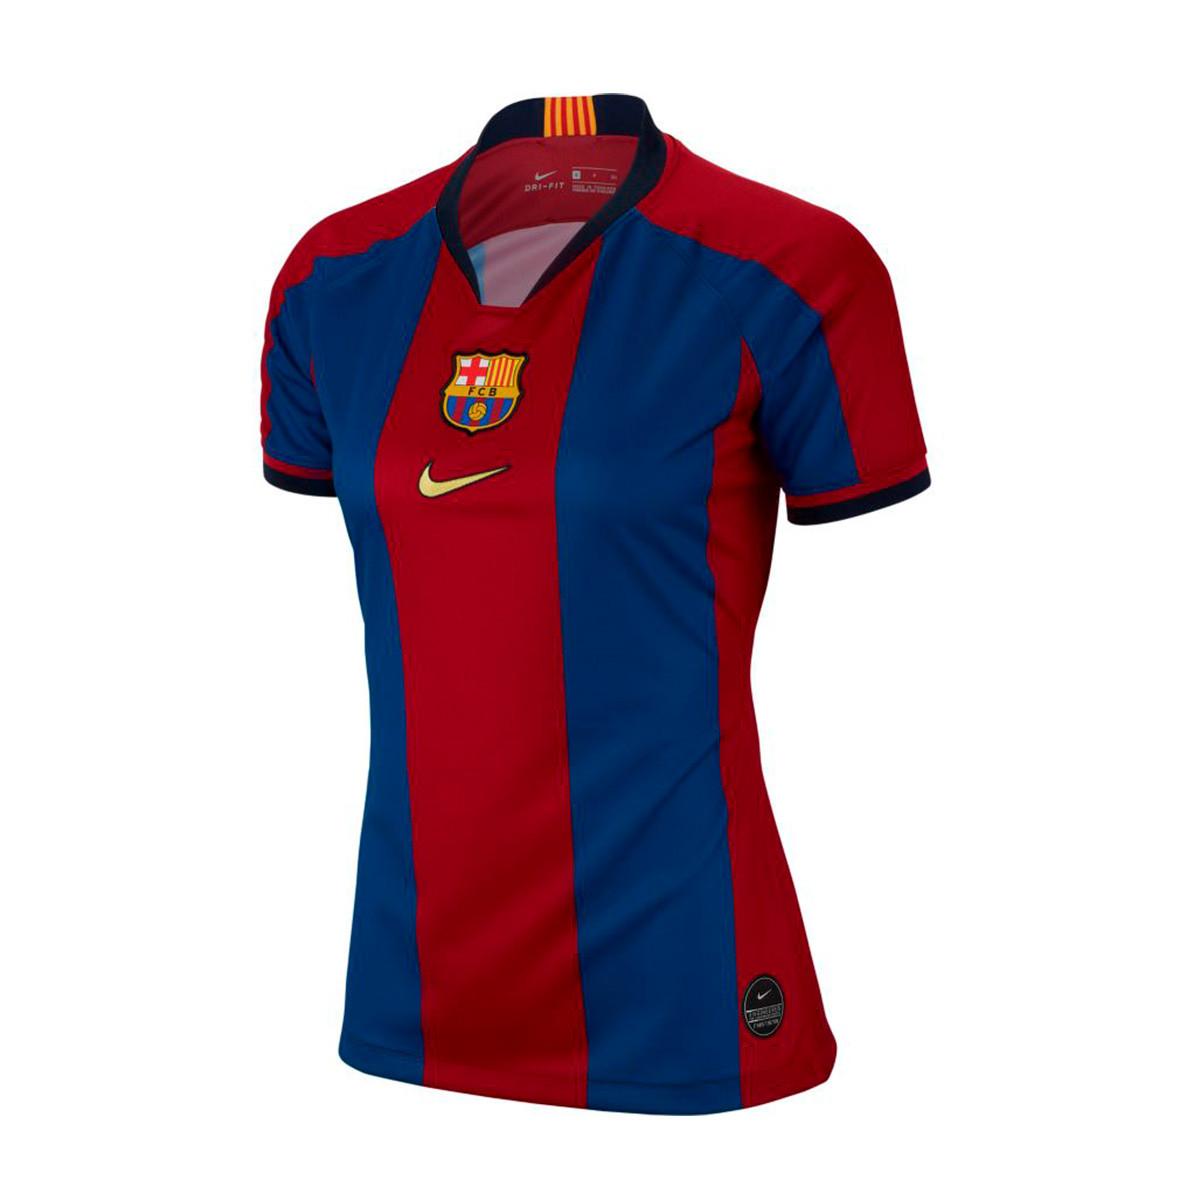 2dd3e94616b Jersey Nike Woman FC Barcelona Breathe Stadium 1998-1999 Collection ...